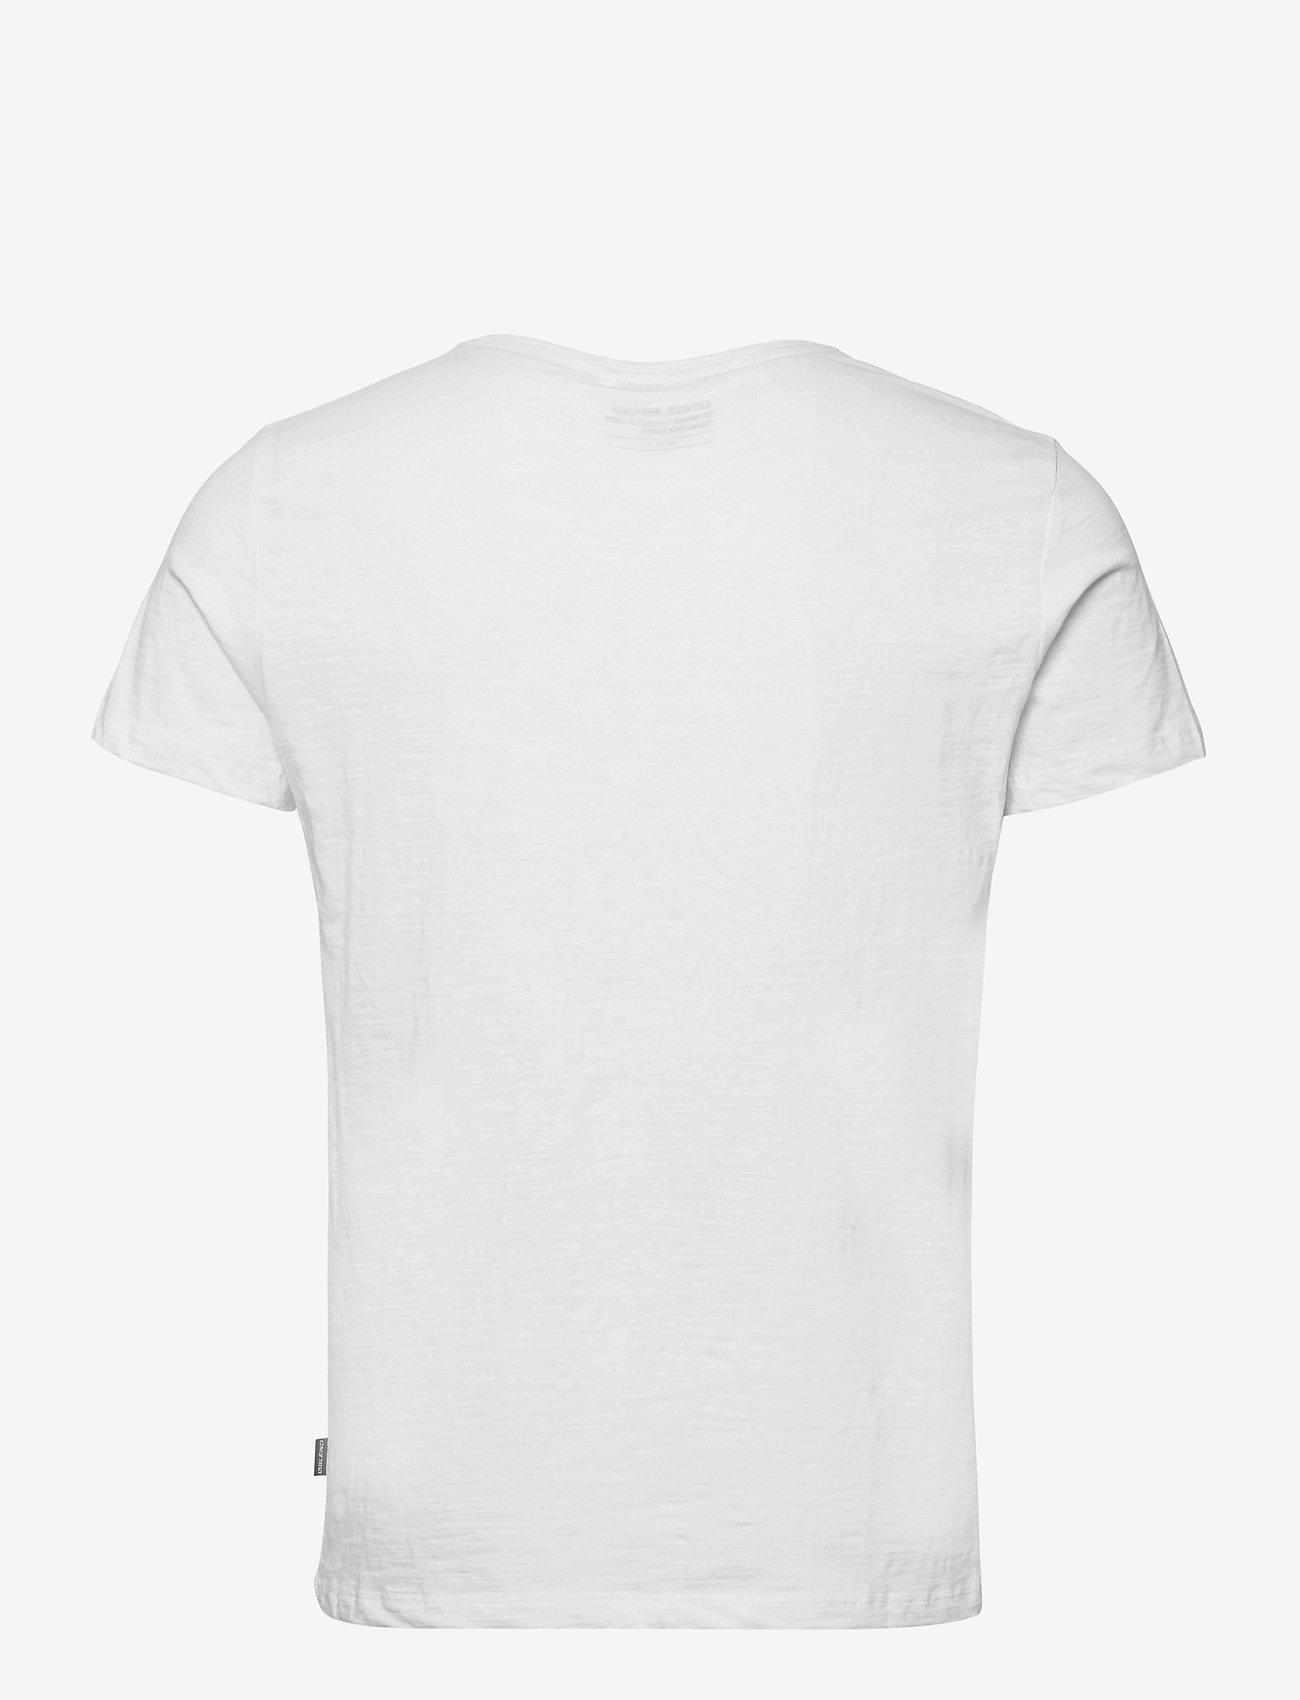 Blend - Tee - t-shirts à manches courtes - bright white - 1